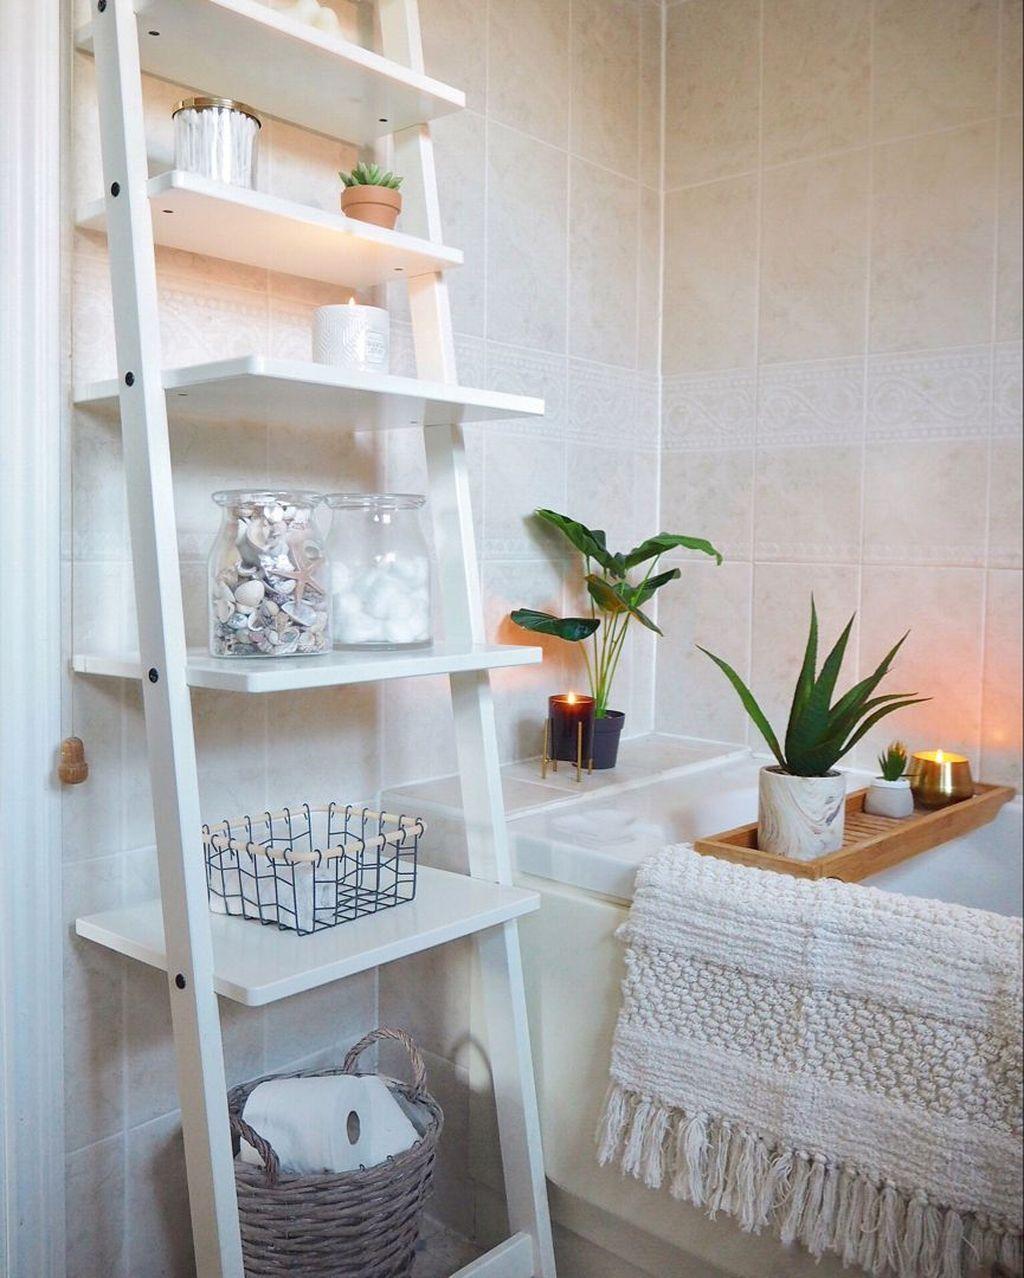 34 Wonderful Minimalist Bathroom Decor Ideas But Looks Luxurious Simple Bathroom Decor Cosy Bathroom Easy Bathroom Makeover